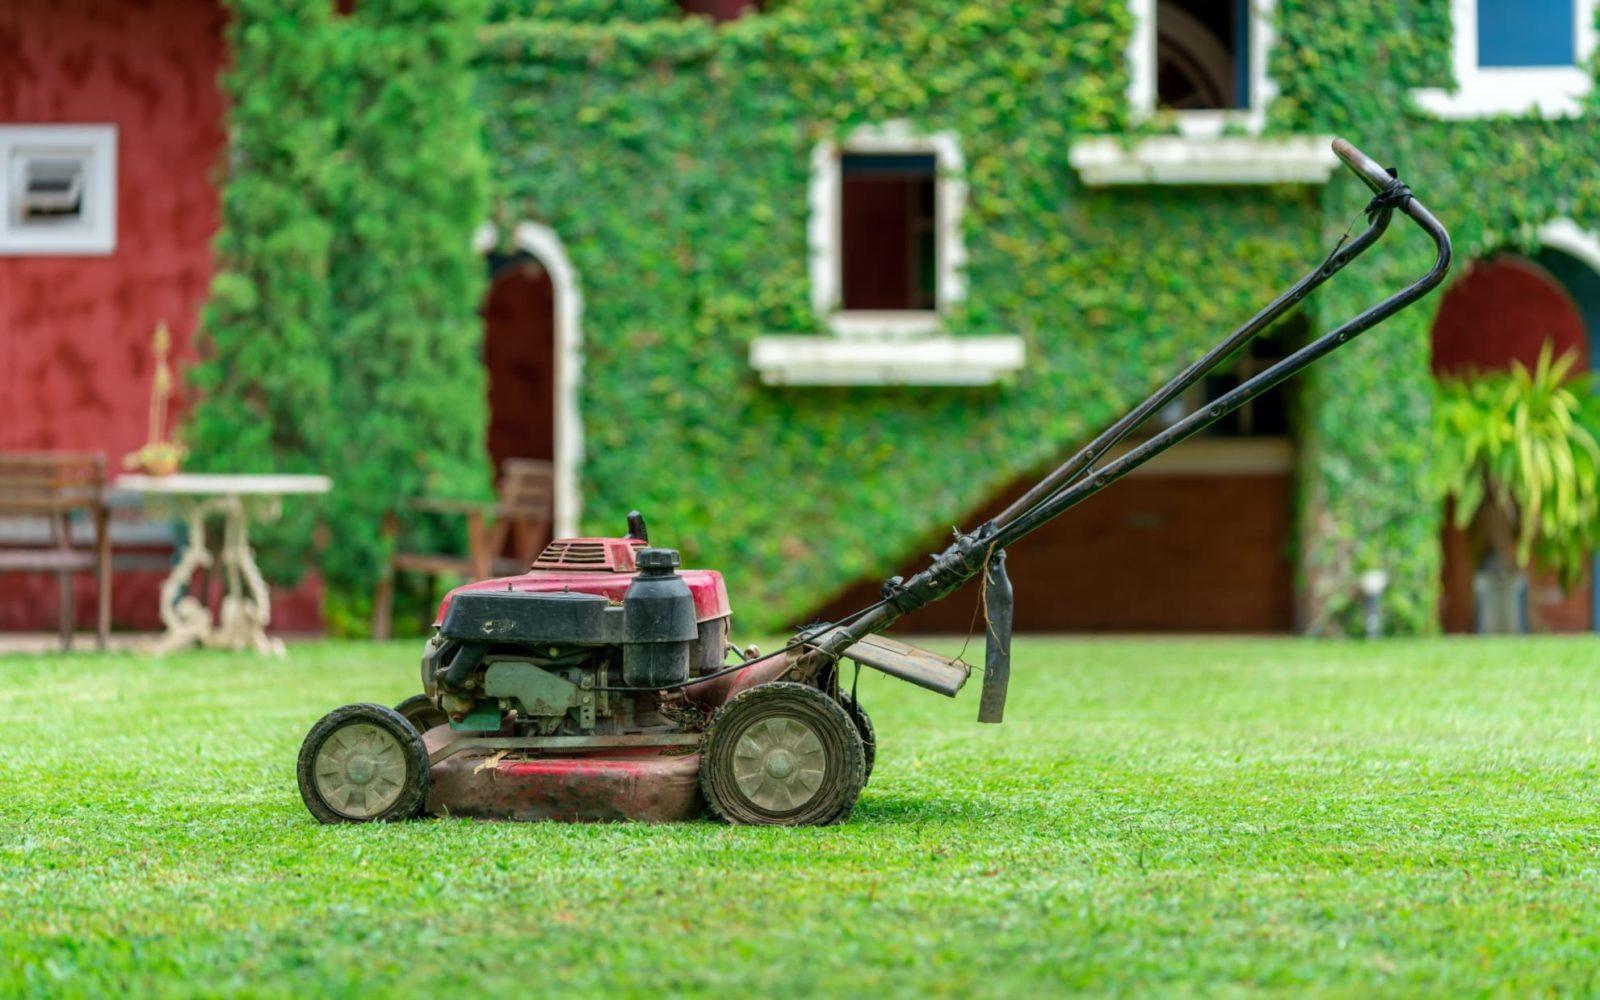 mulching lawn mower sat on grass